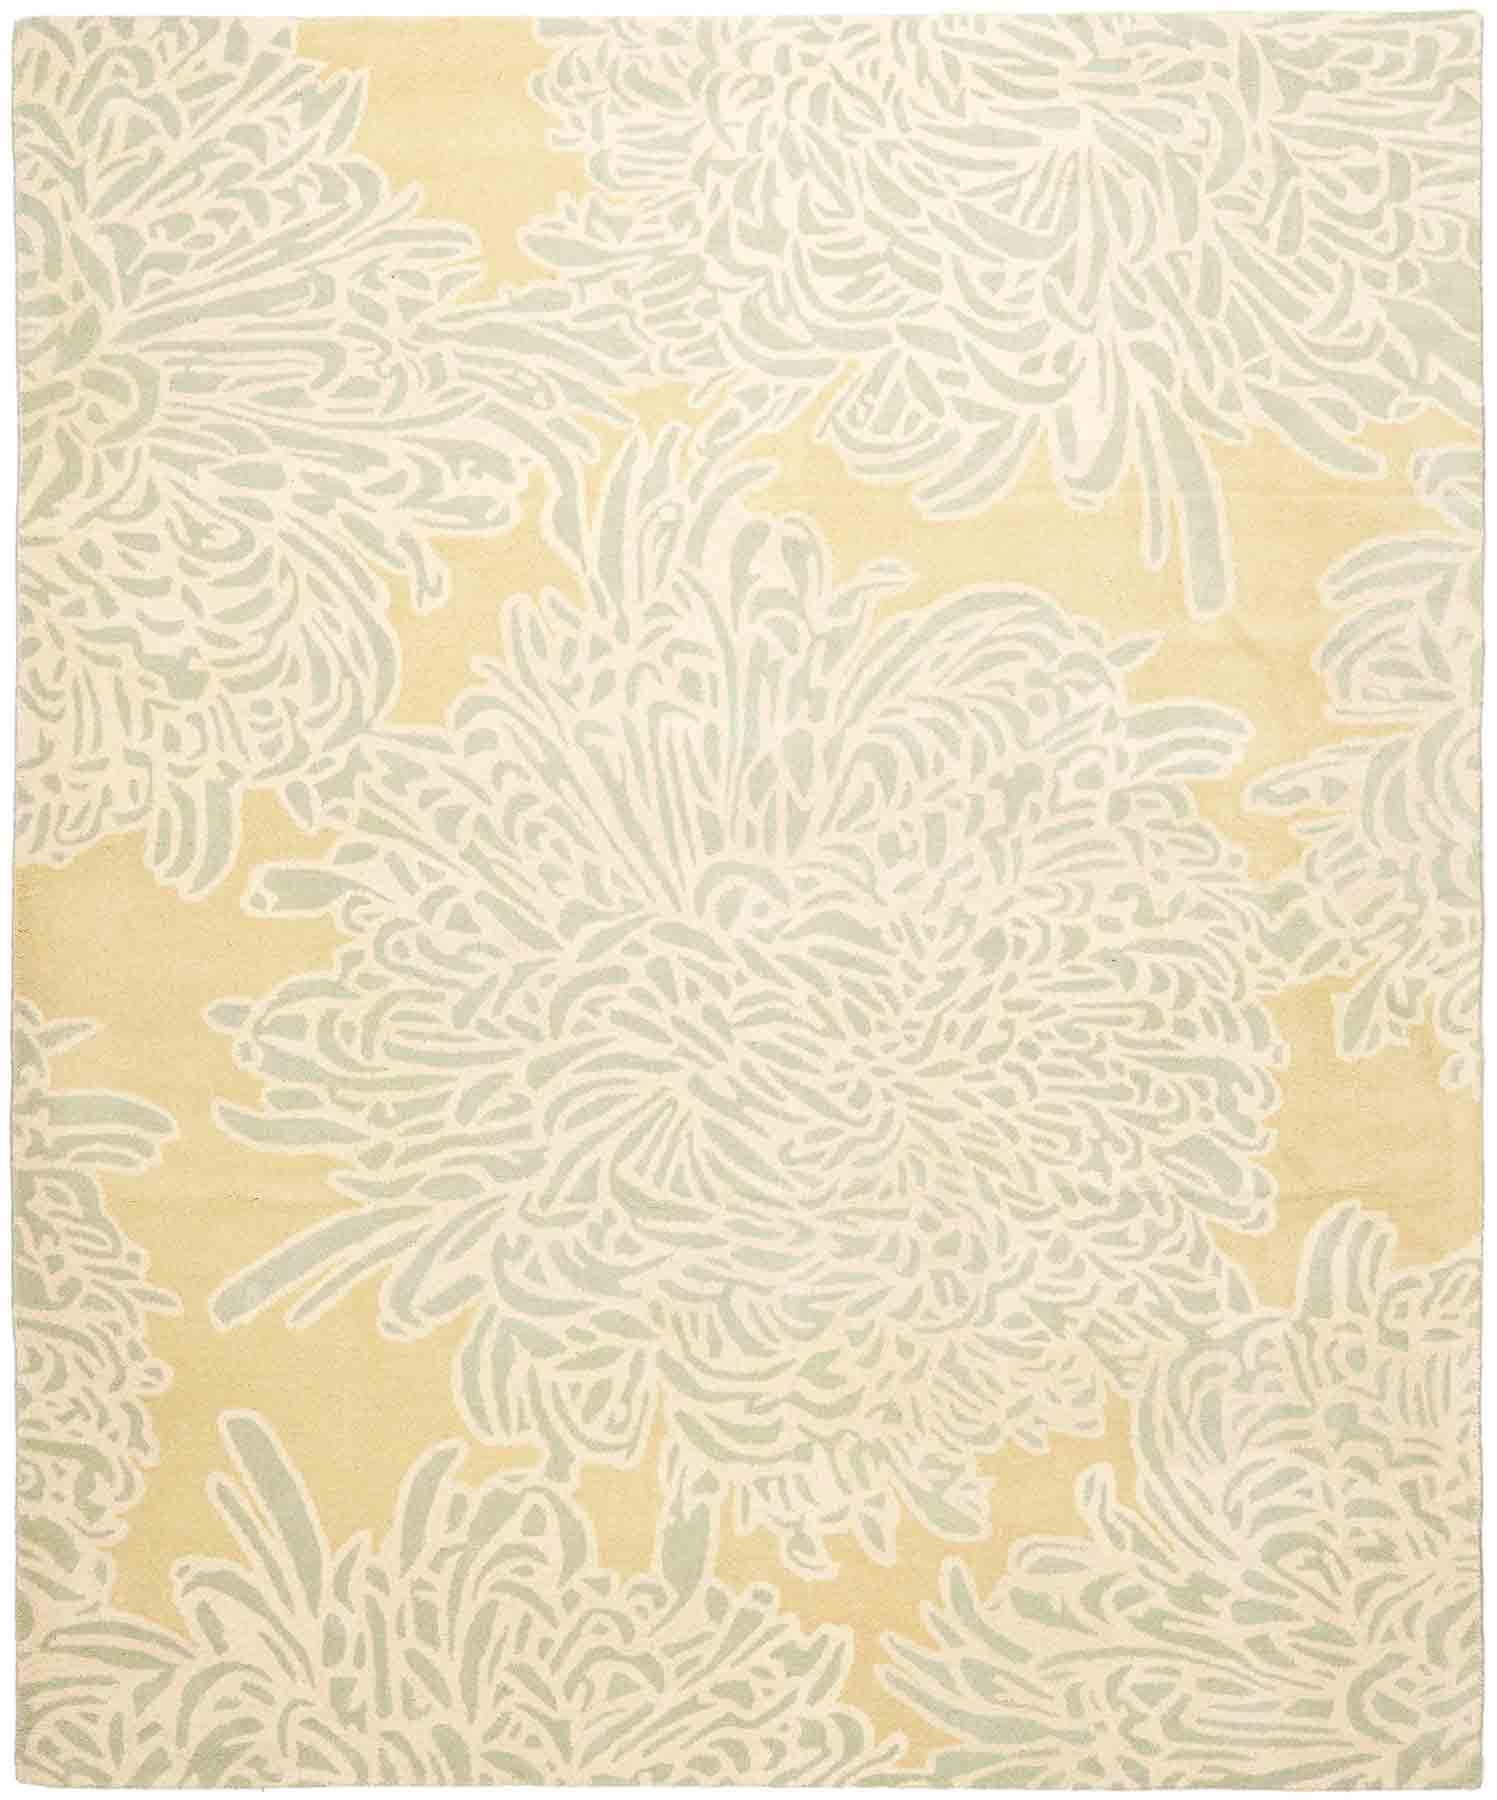 Rug Msr4542d Chrysanthemum Martha Stewart Area Rugs By